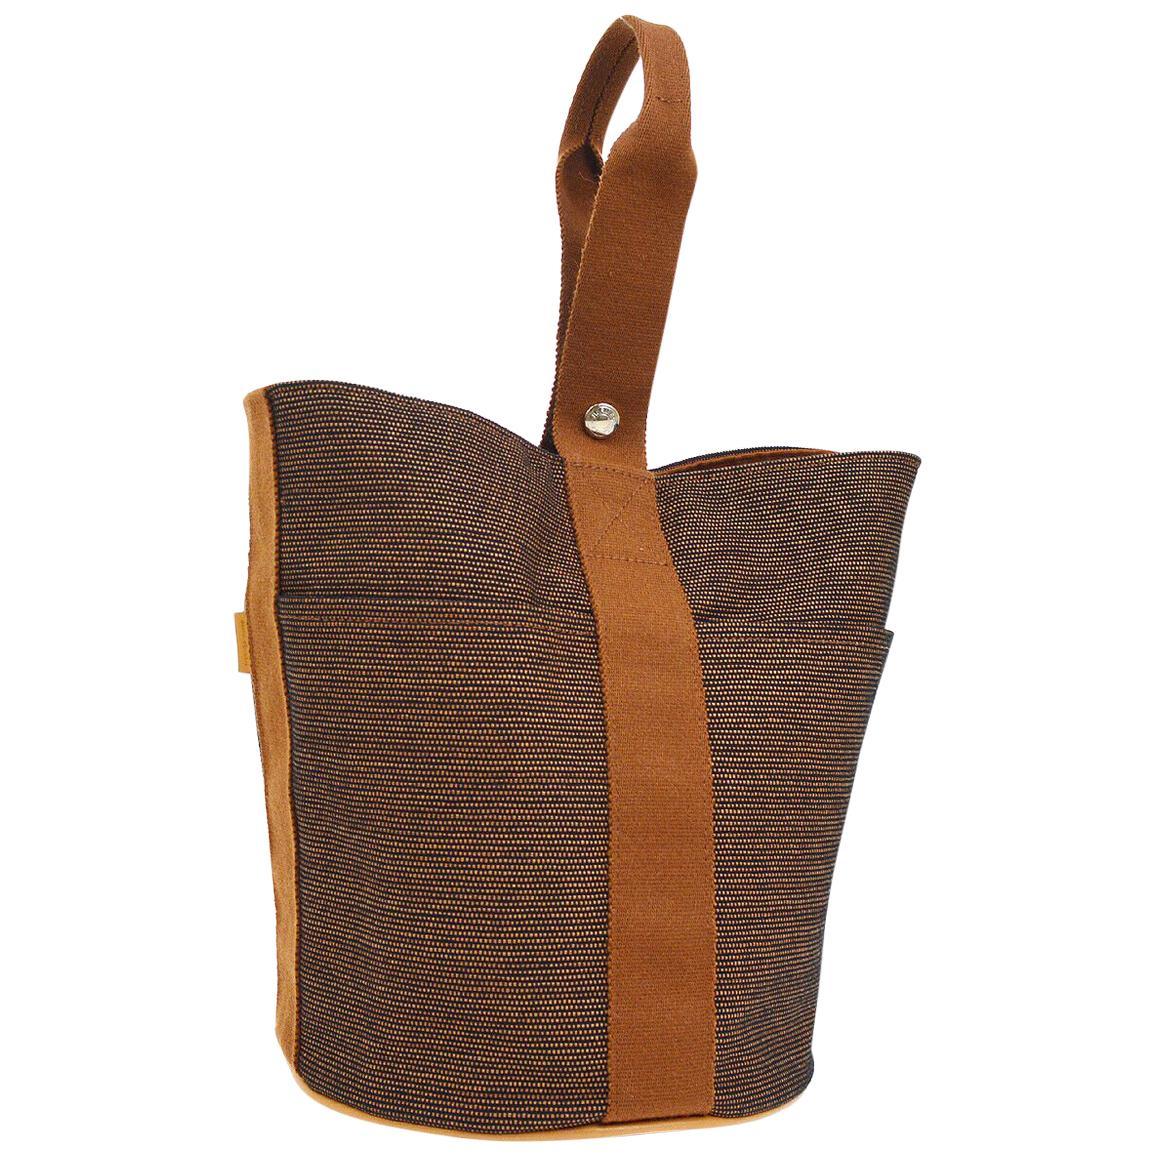 Hermes Cognac Brown Canvas Small Mini Top Handle Satchel Evening Bag